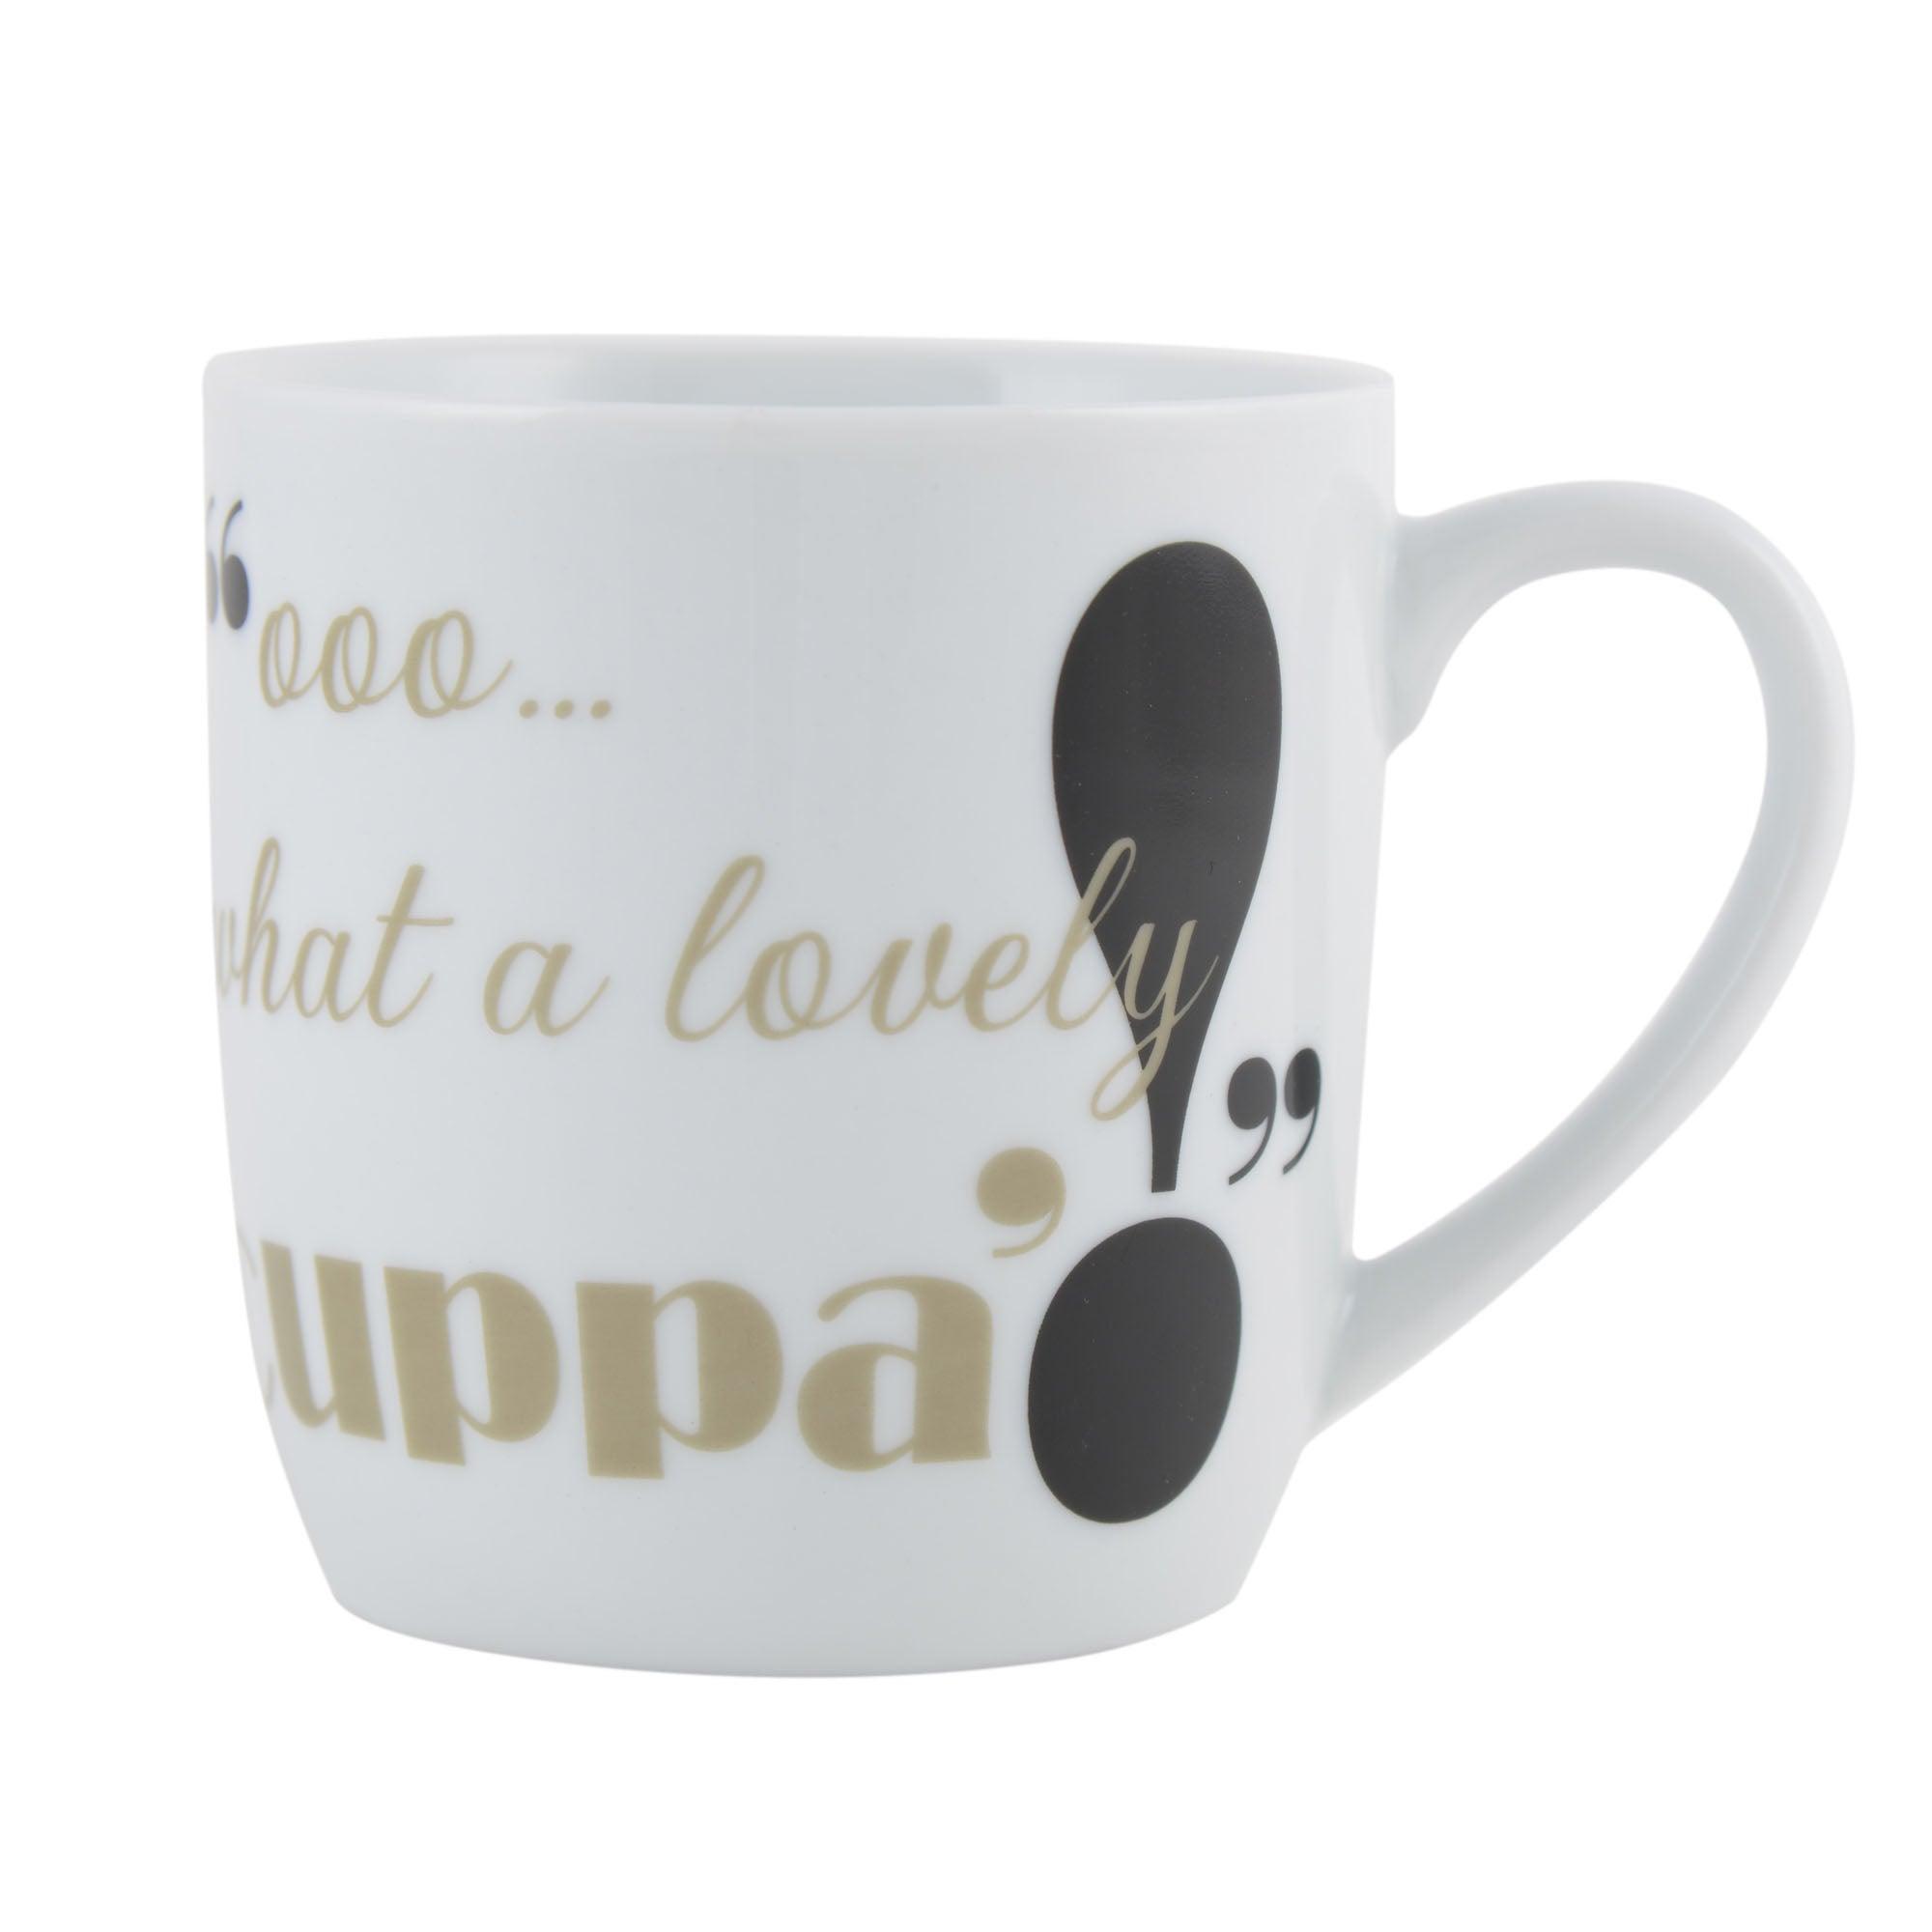 What A Lovely Cuppa Barrel Mug